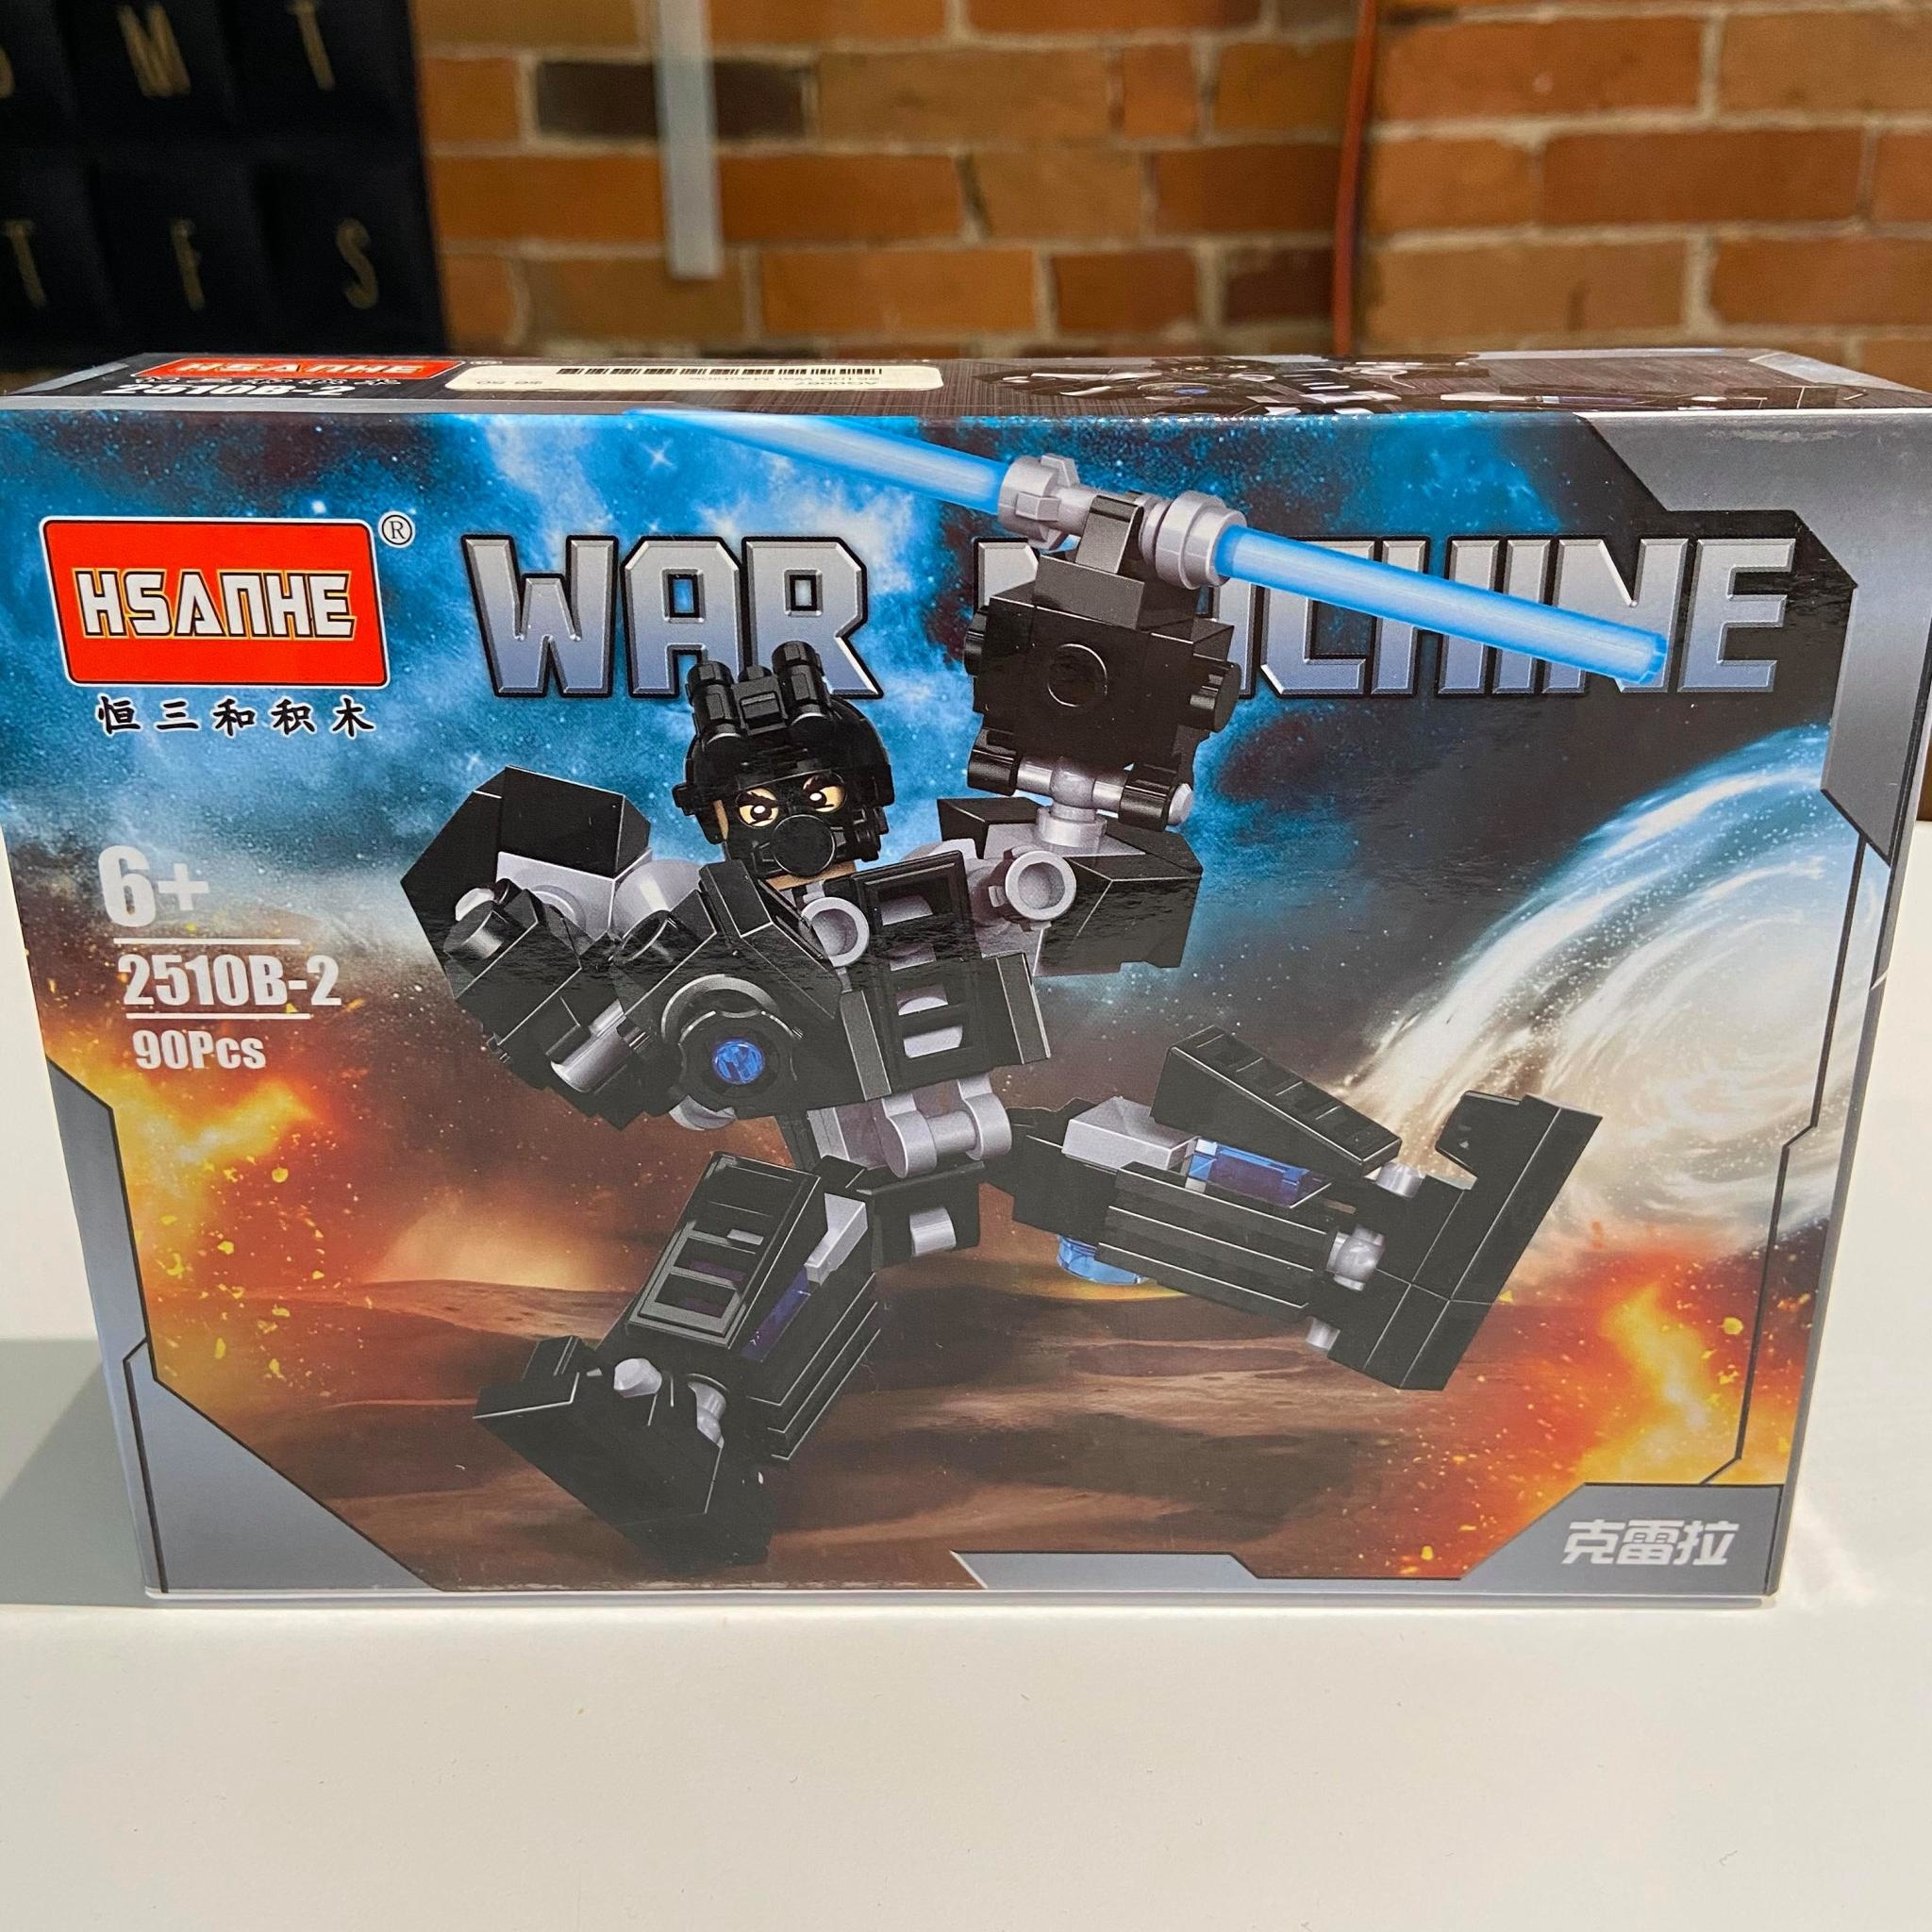 2510B War Machine